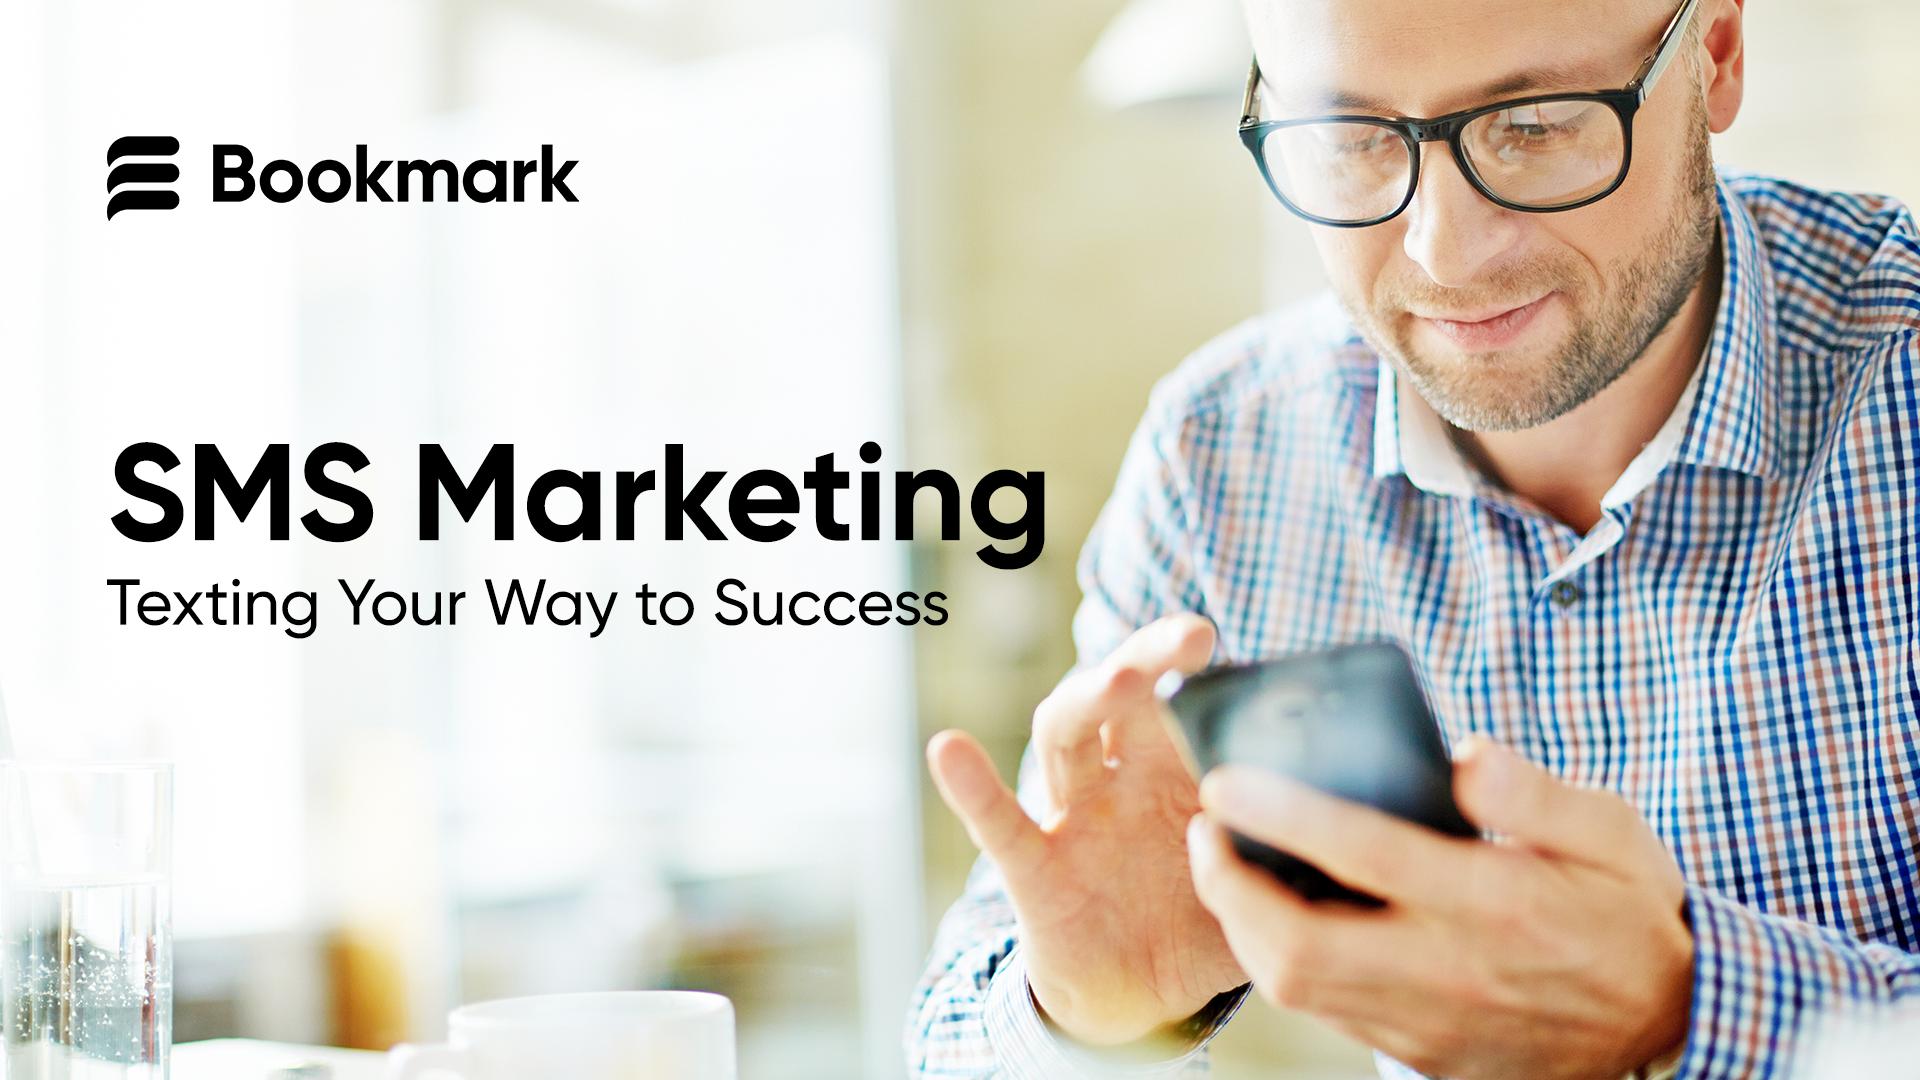 SMS Marketing, sms marketing 2021, sms marketing 101, sms, text message marketing, multi-channel marketing 2021, online business, online business marketing, sms ecommerce